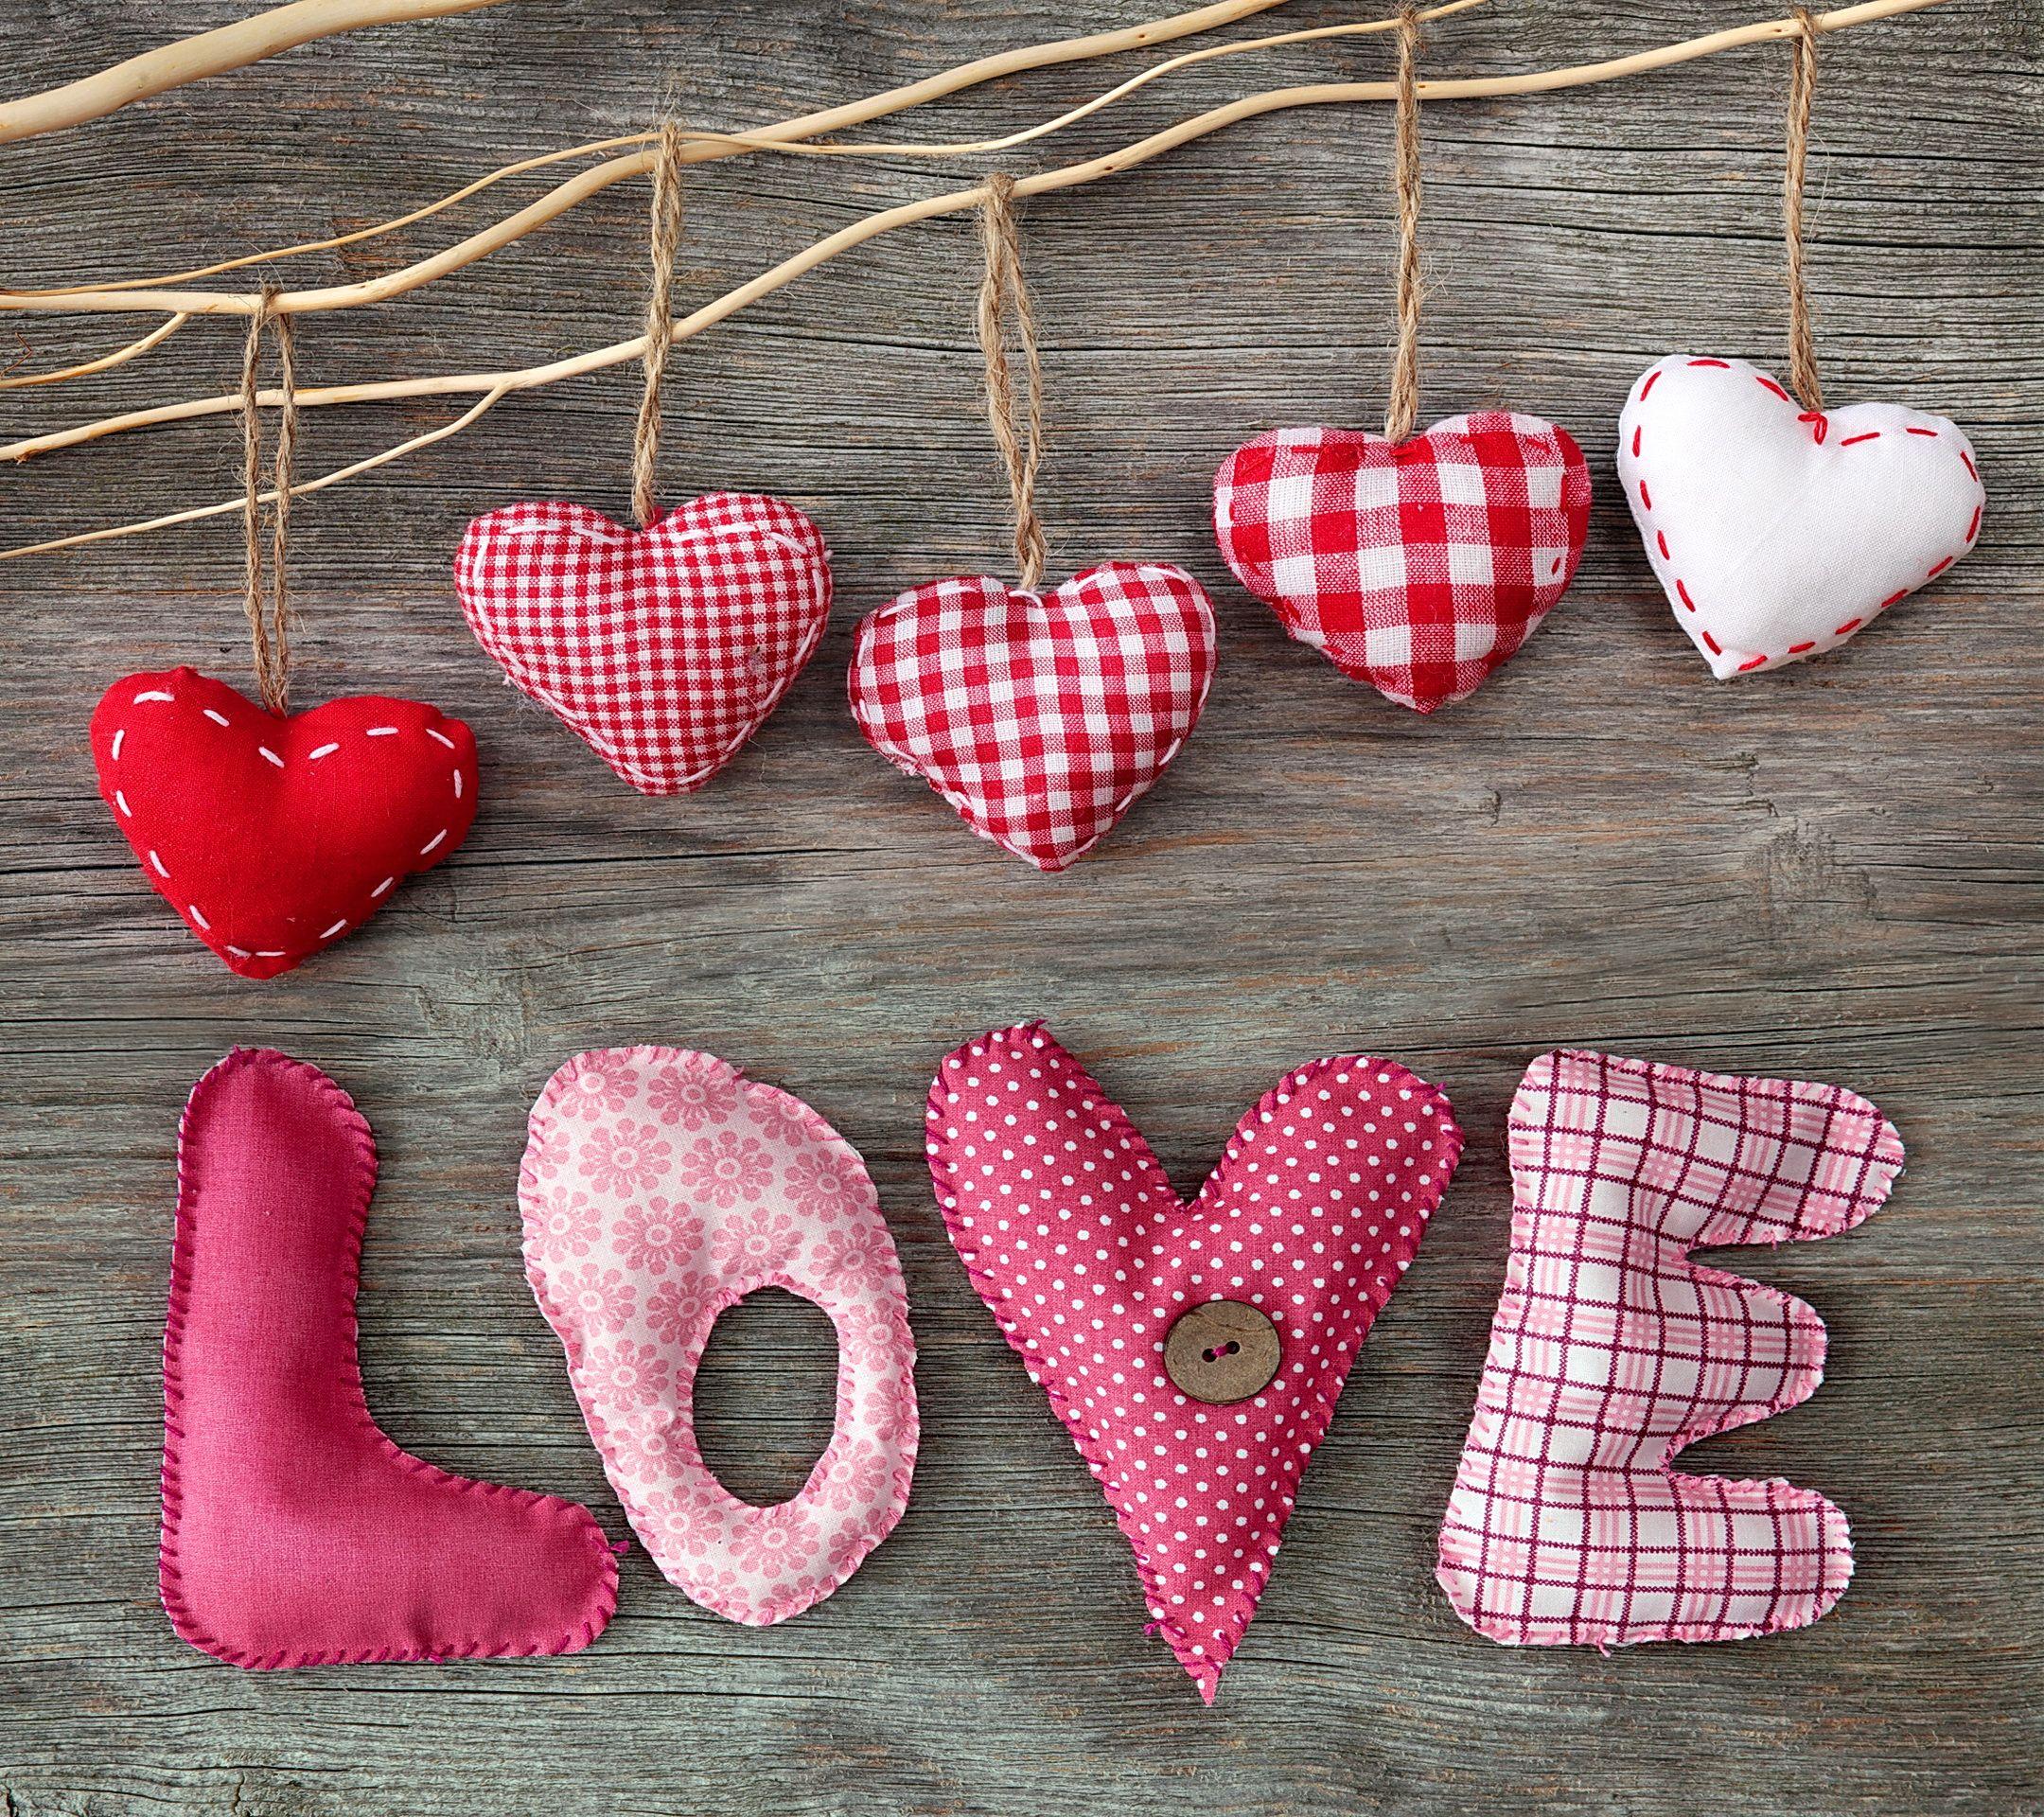 love heart hd wallpaper | hearts | pinterest | wallpaper and stitch